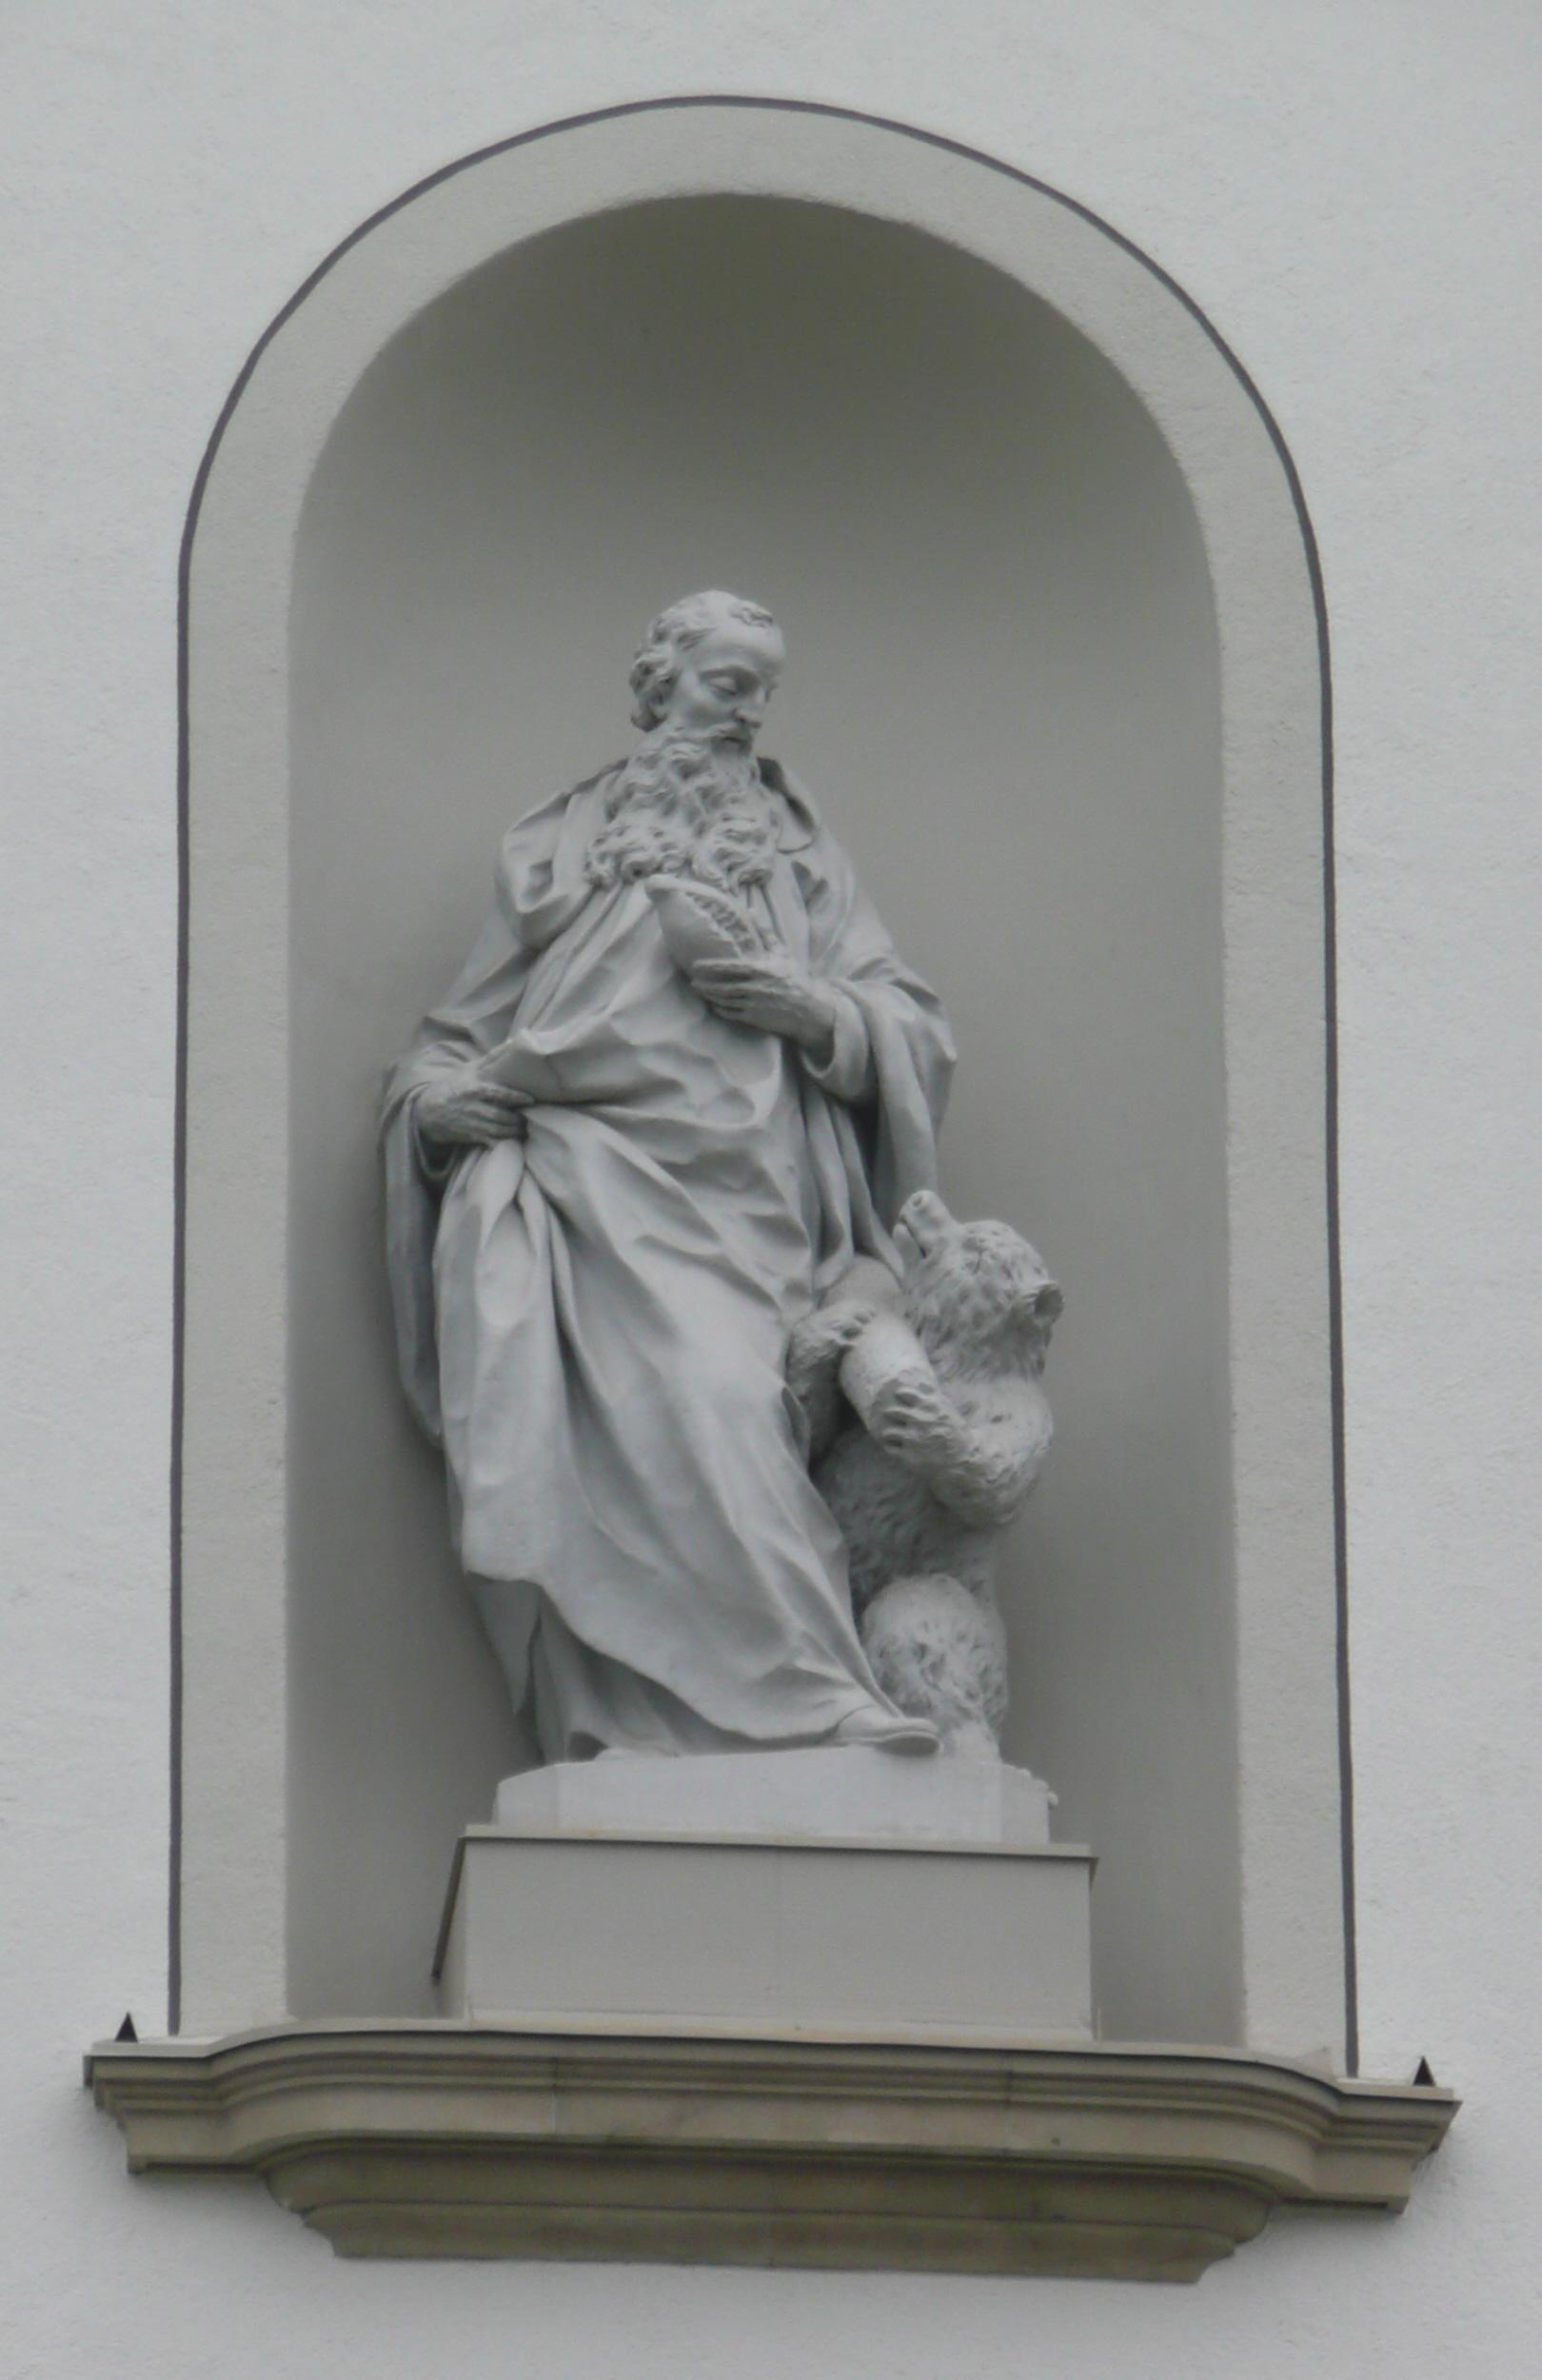 Statue von Johann Christian Wentzinger an der Stiftskirche St. Gallen, um 1760